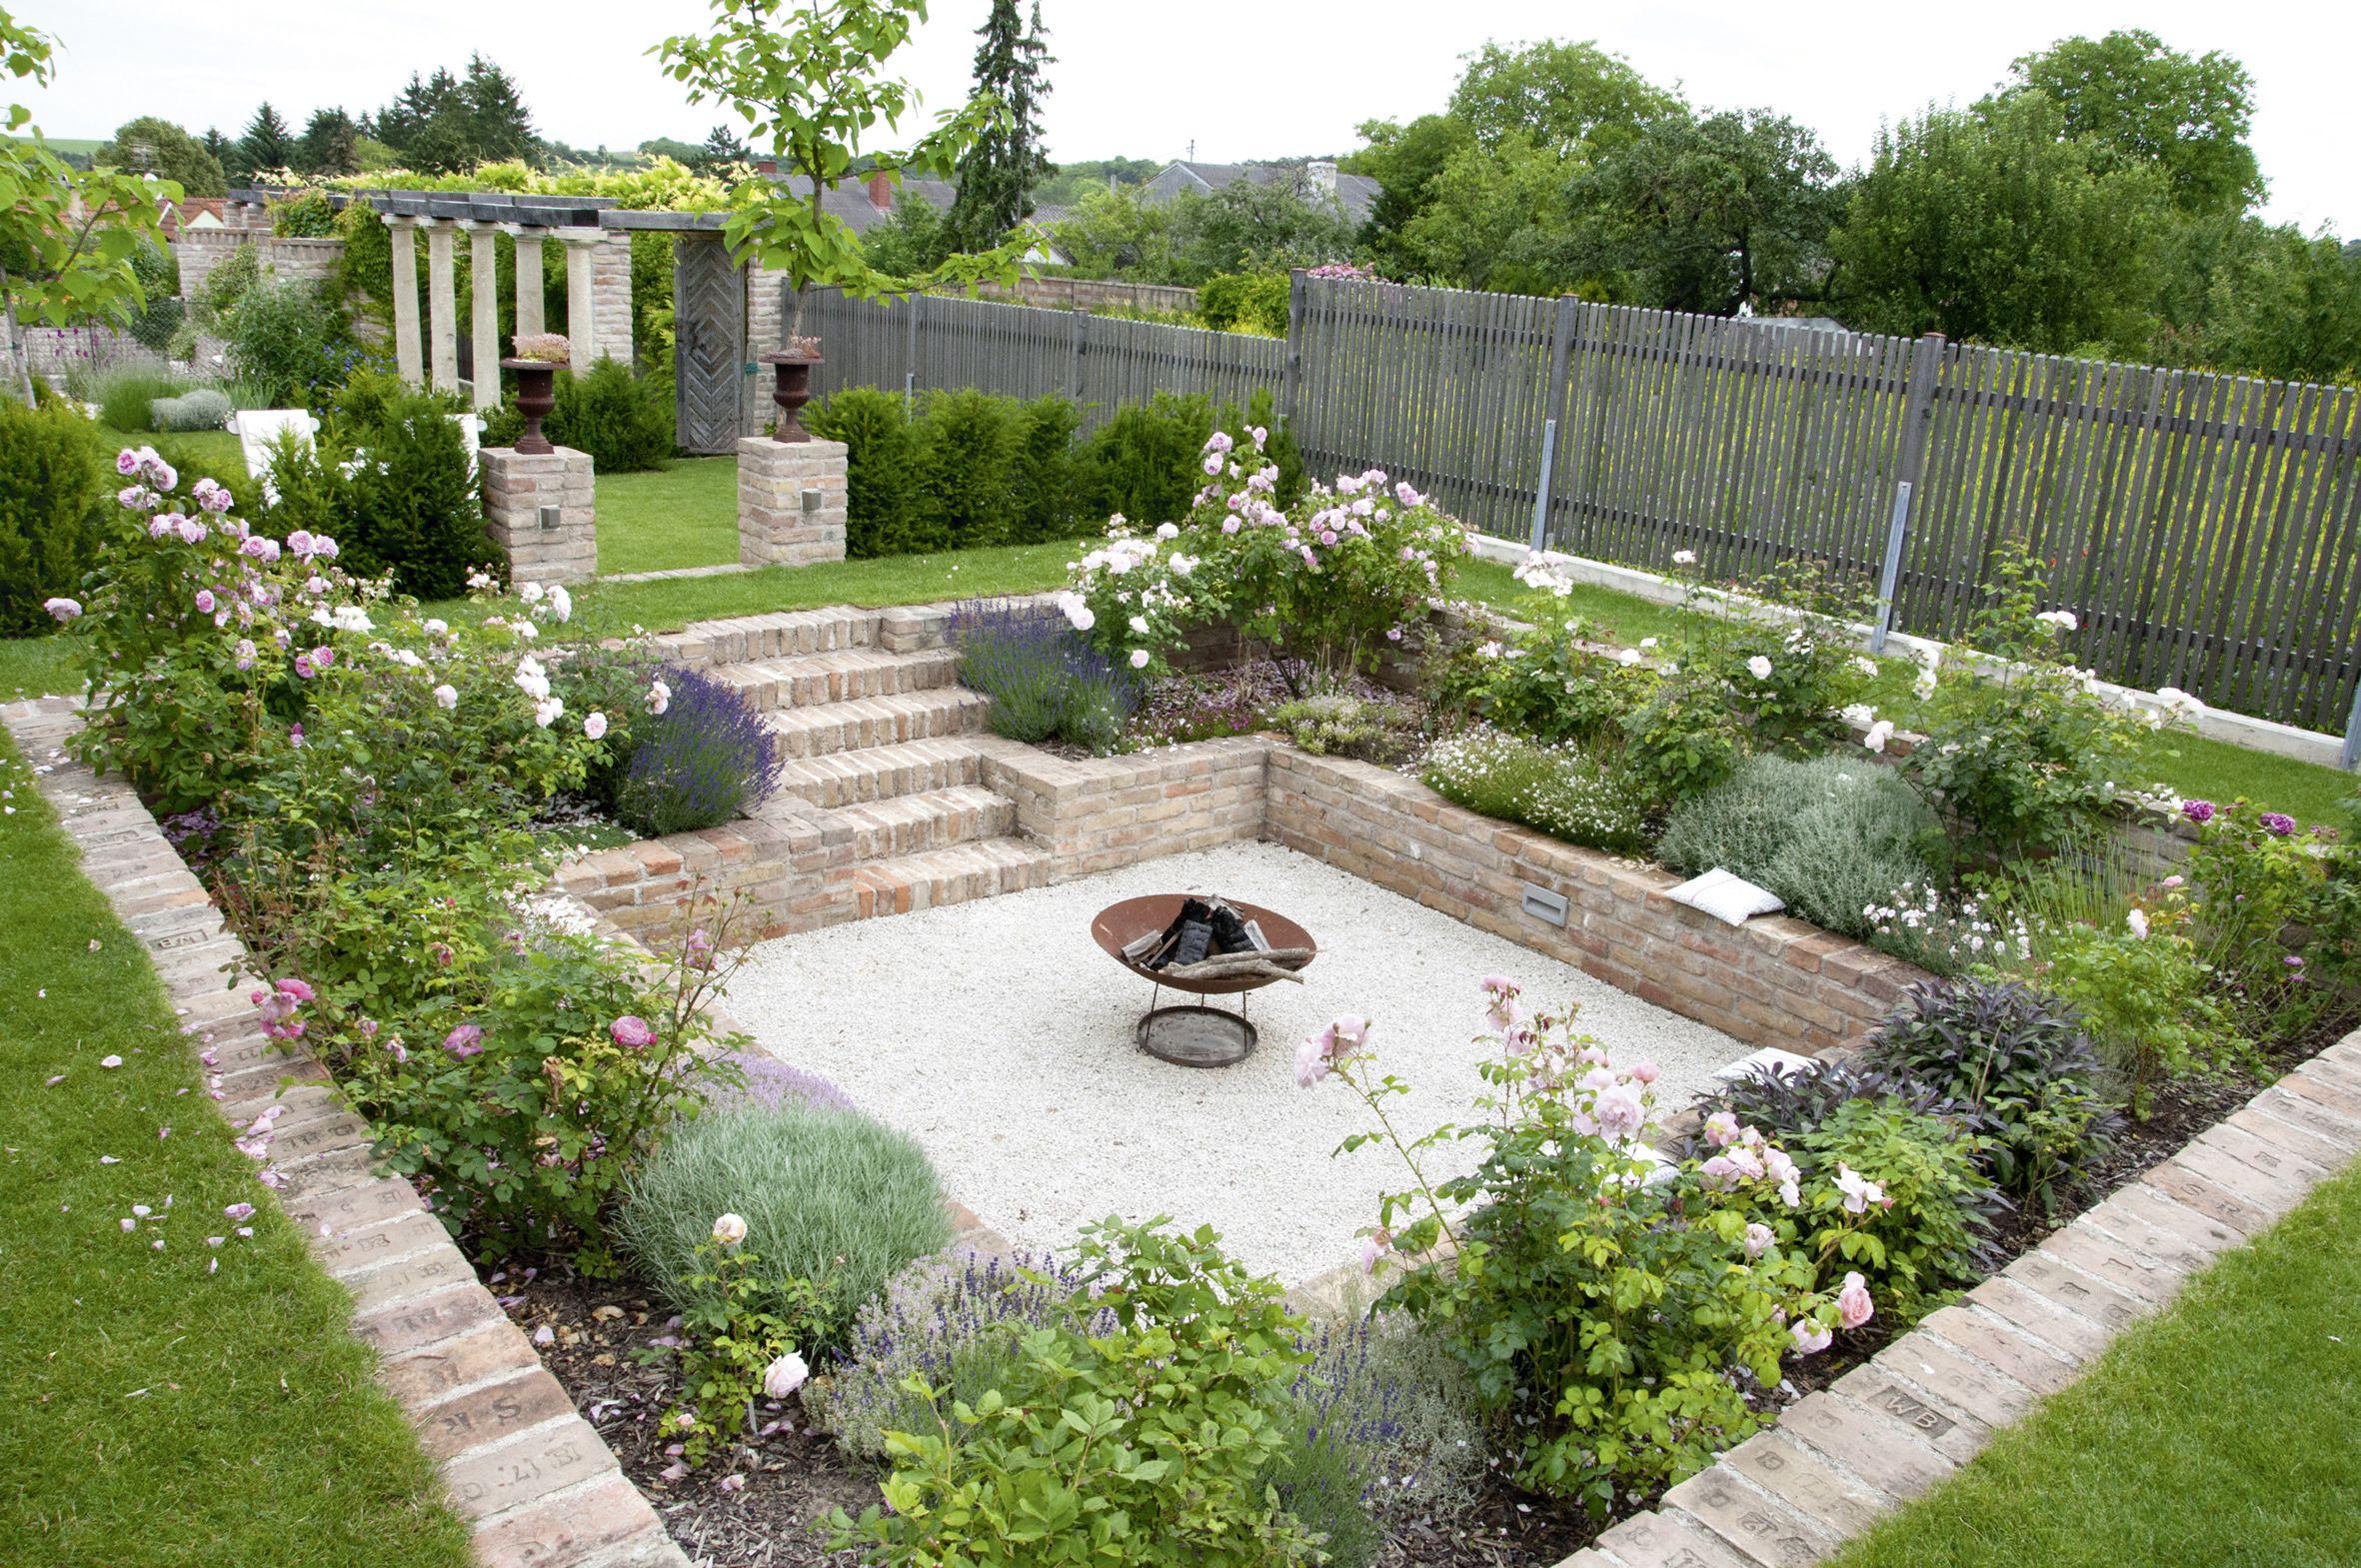 Senkgarten Einfach Mal Tiefer Gelegt In 2021 Garten Versunkener Garten Garten Planen